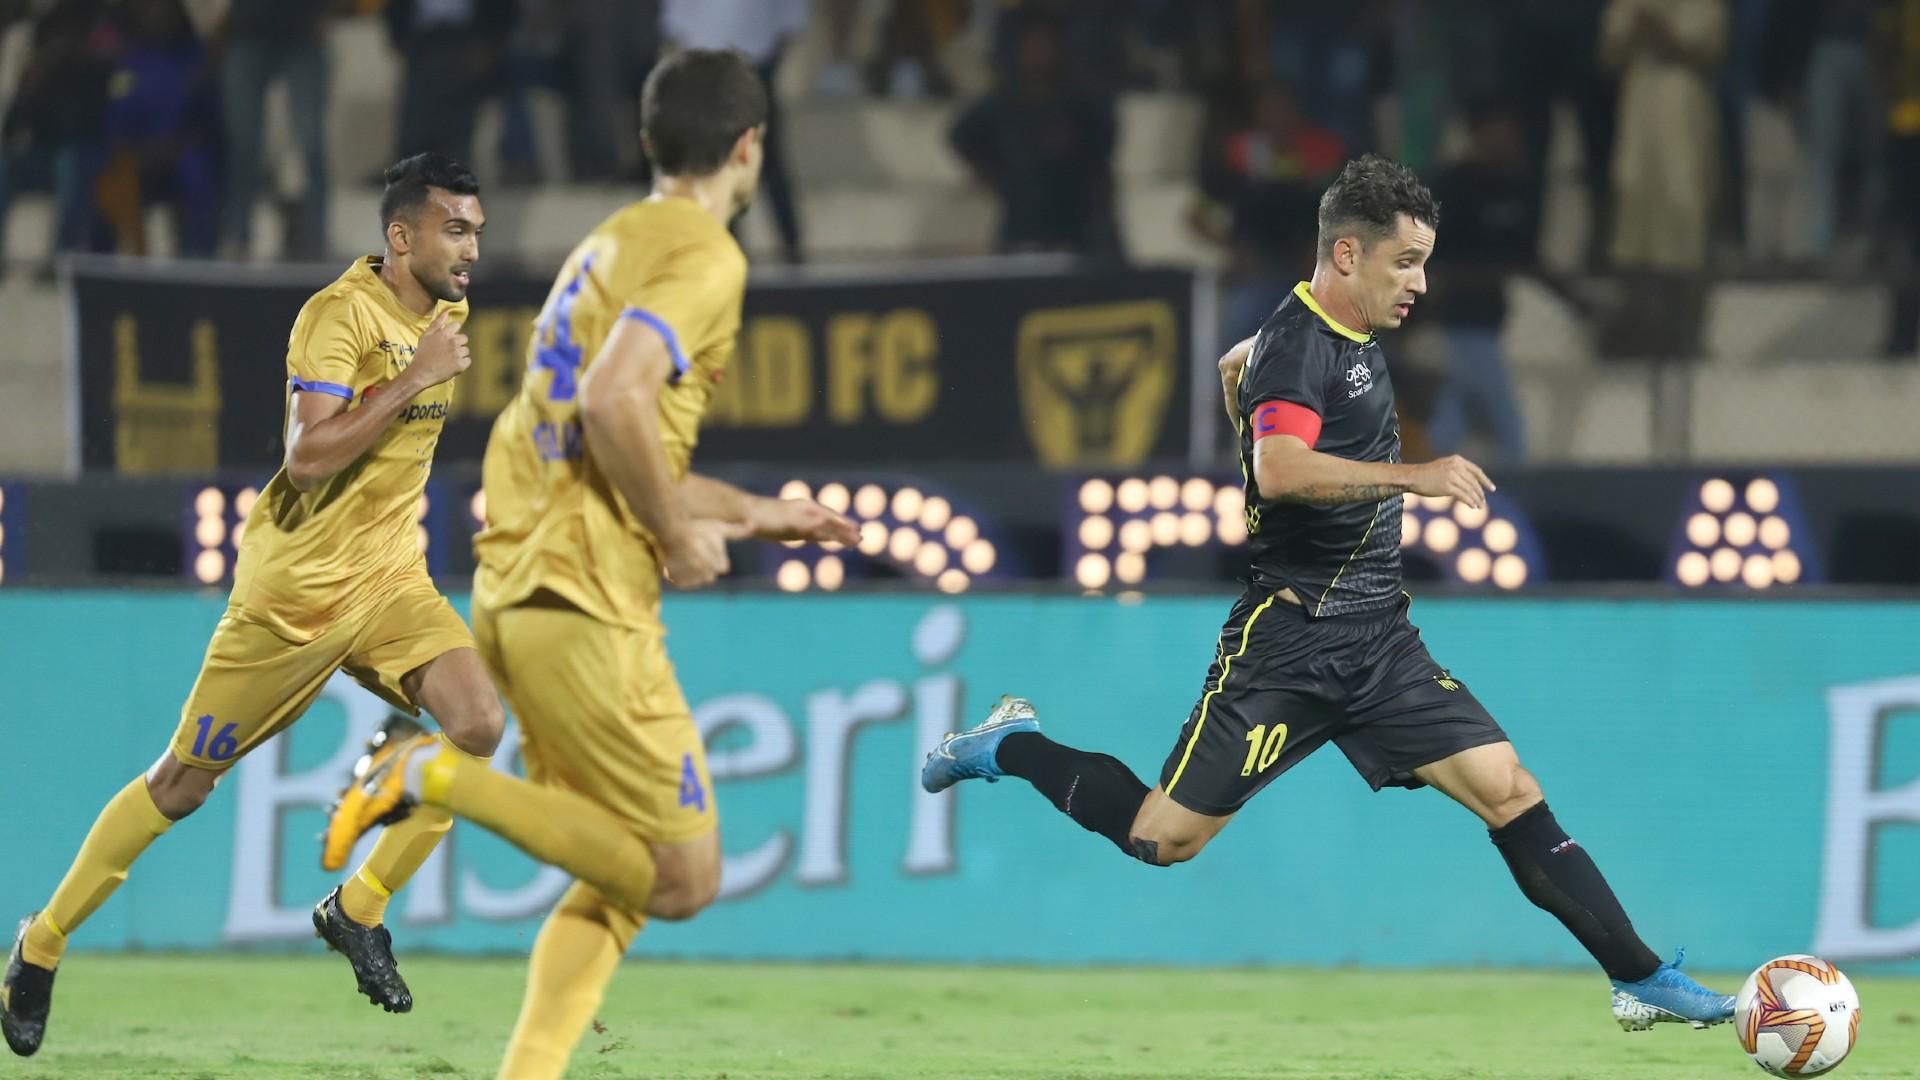 Javier Gurri Lopez: Hyderabad are planning for next season